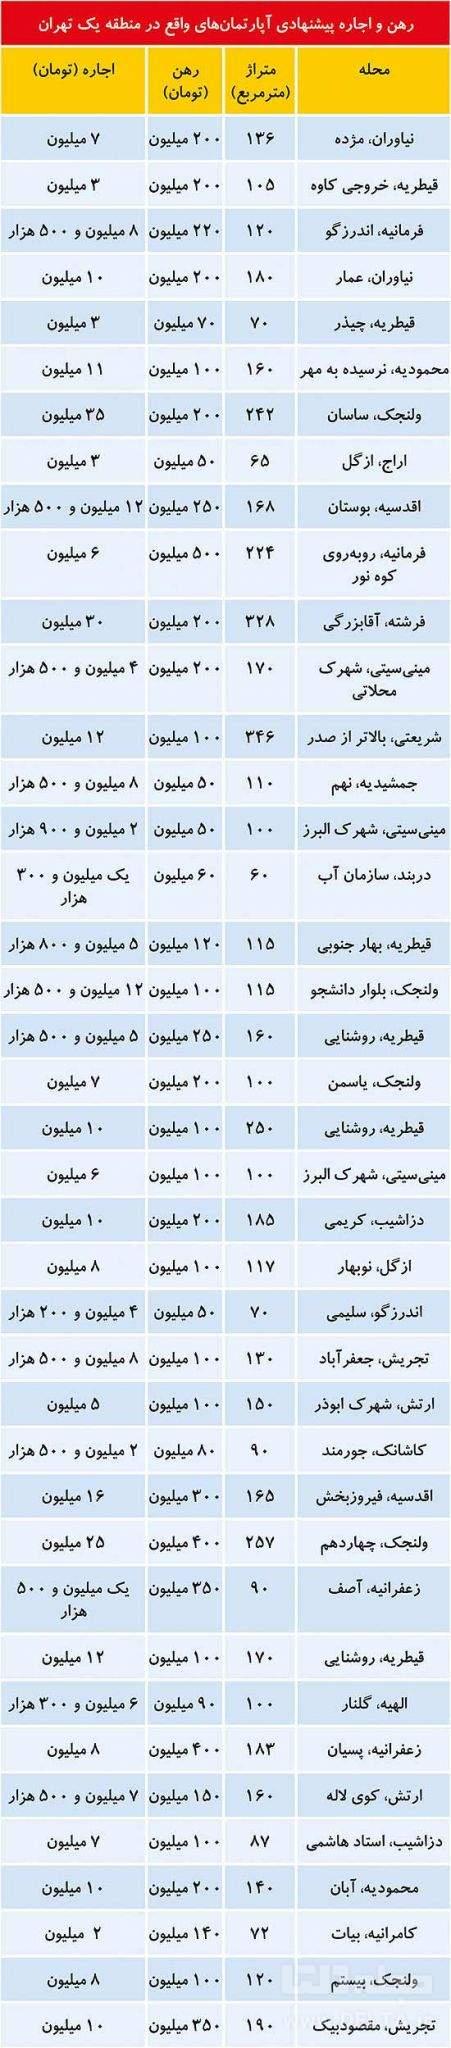 قیمت آپارتمان شمال تهران